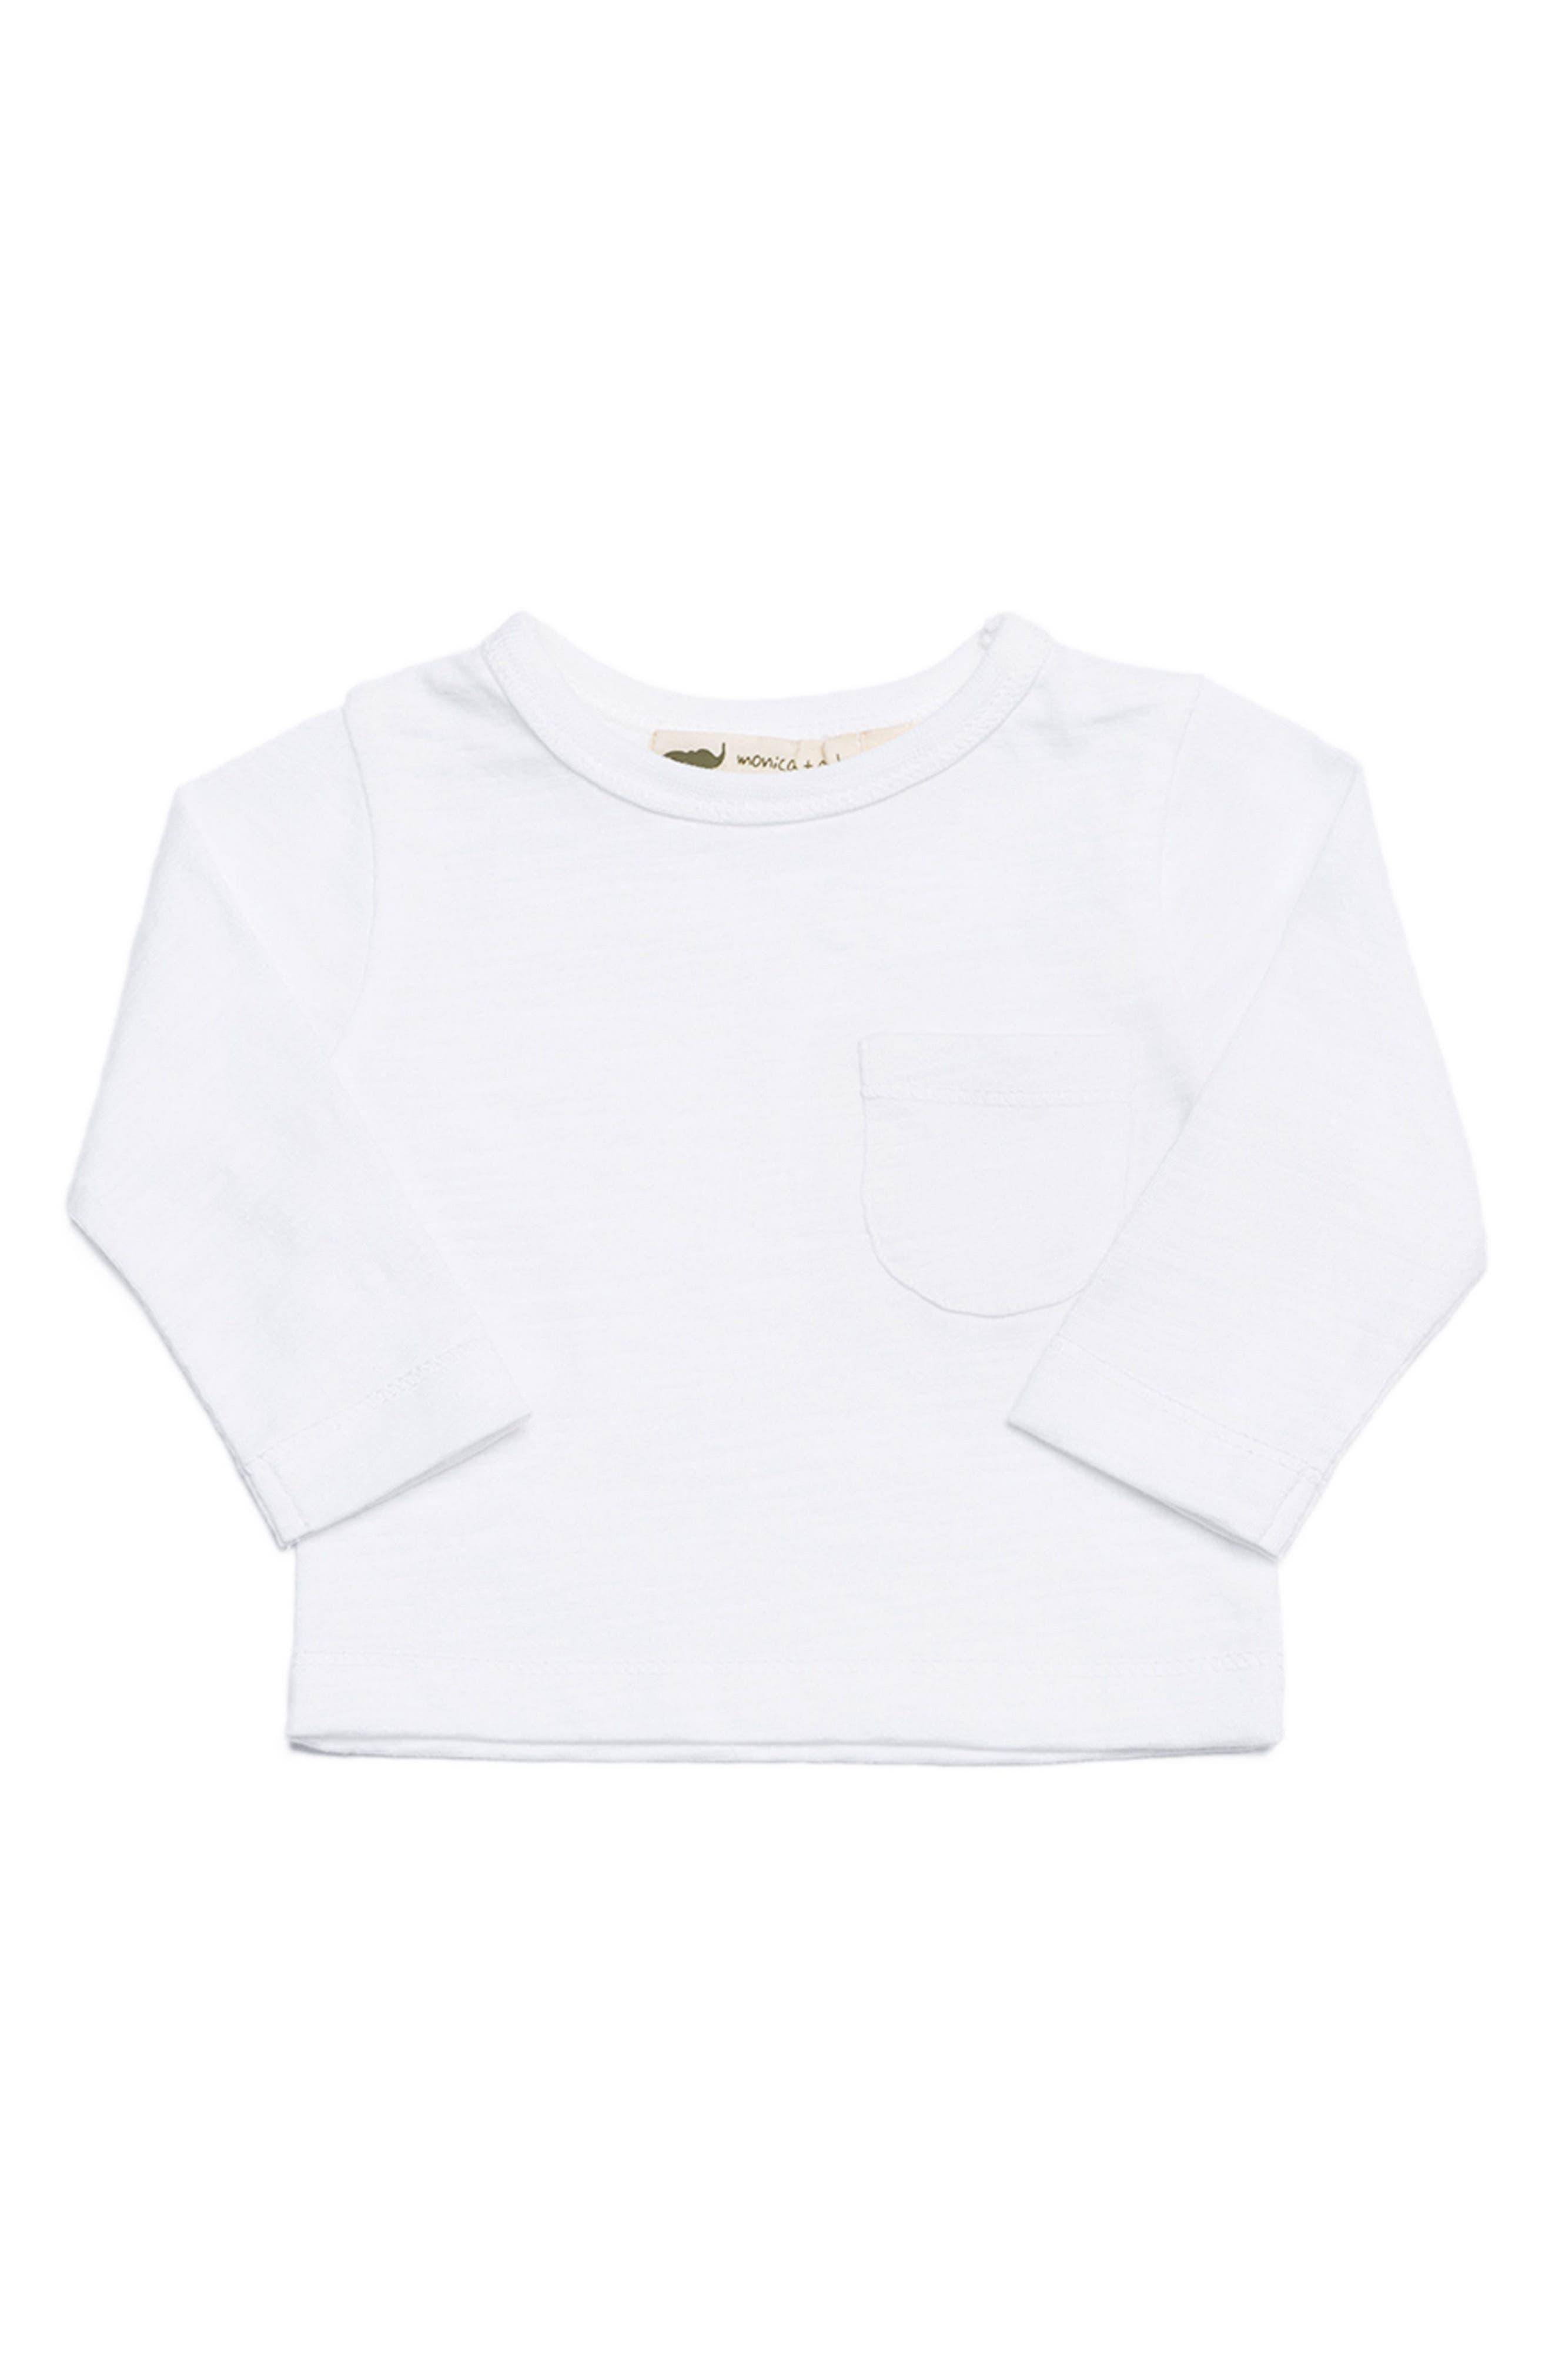 Monica + Andy Organic Cotton Pocket T-Shirt (Baby Boys)